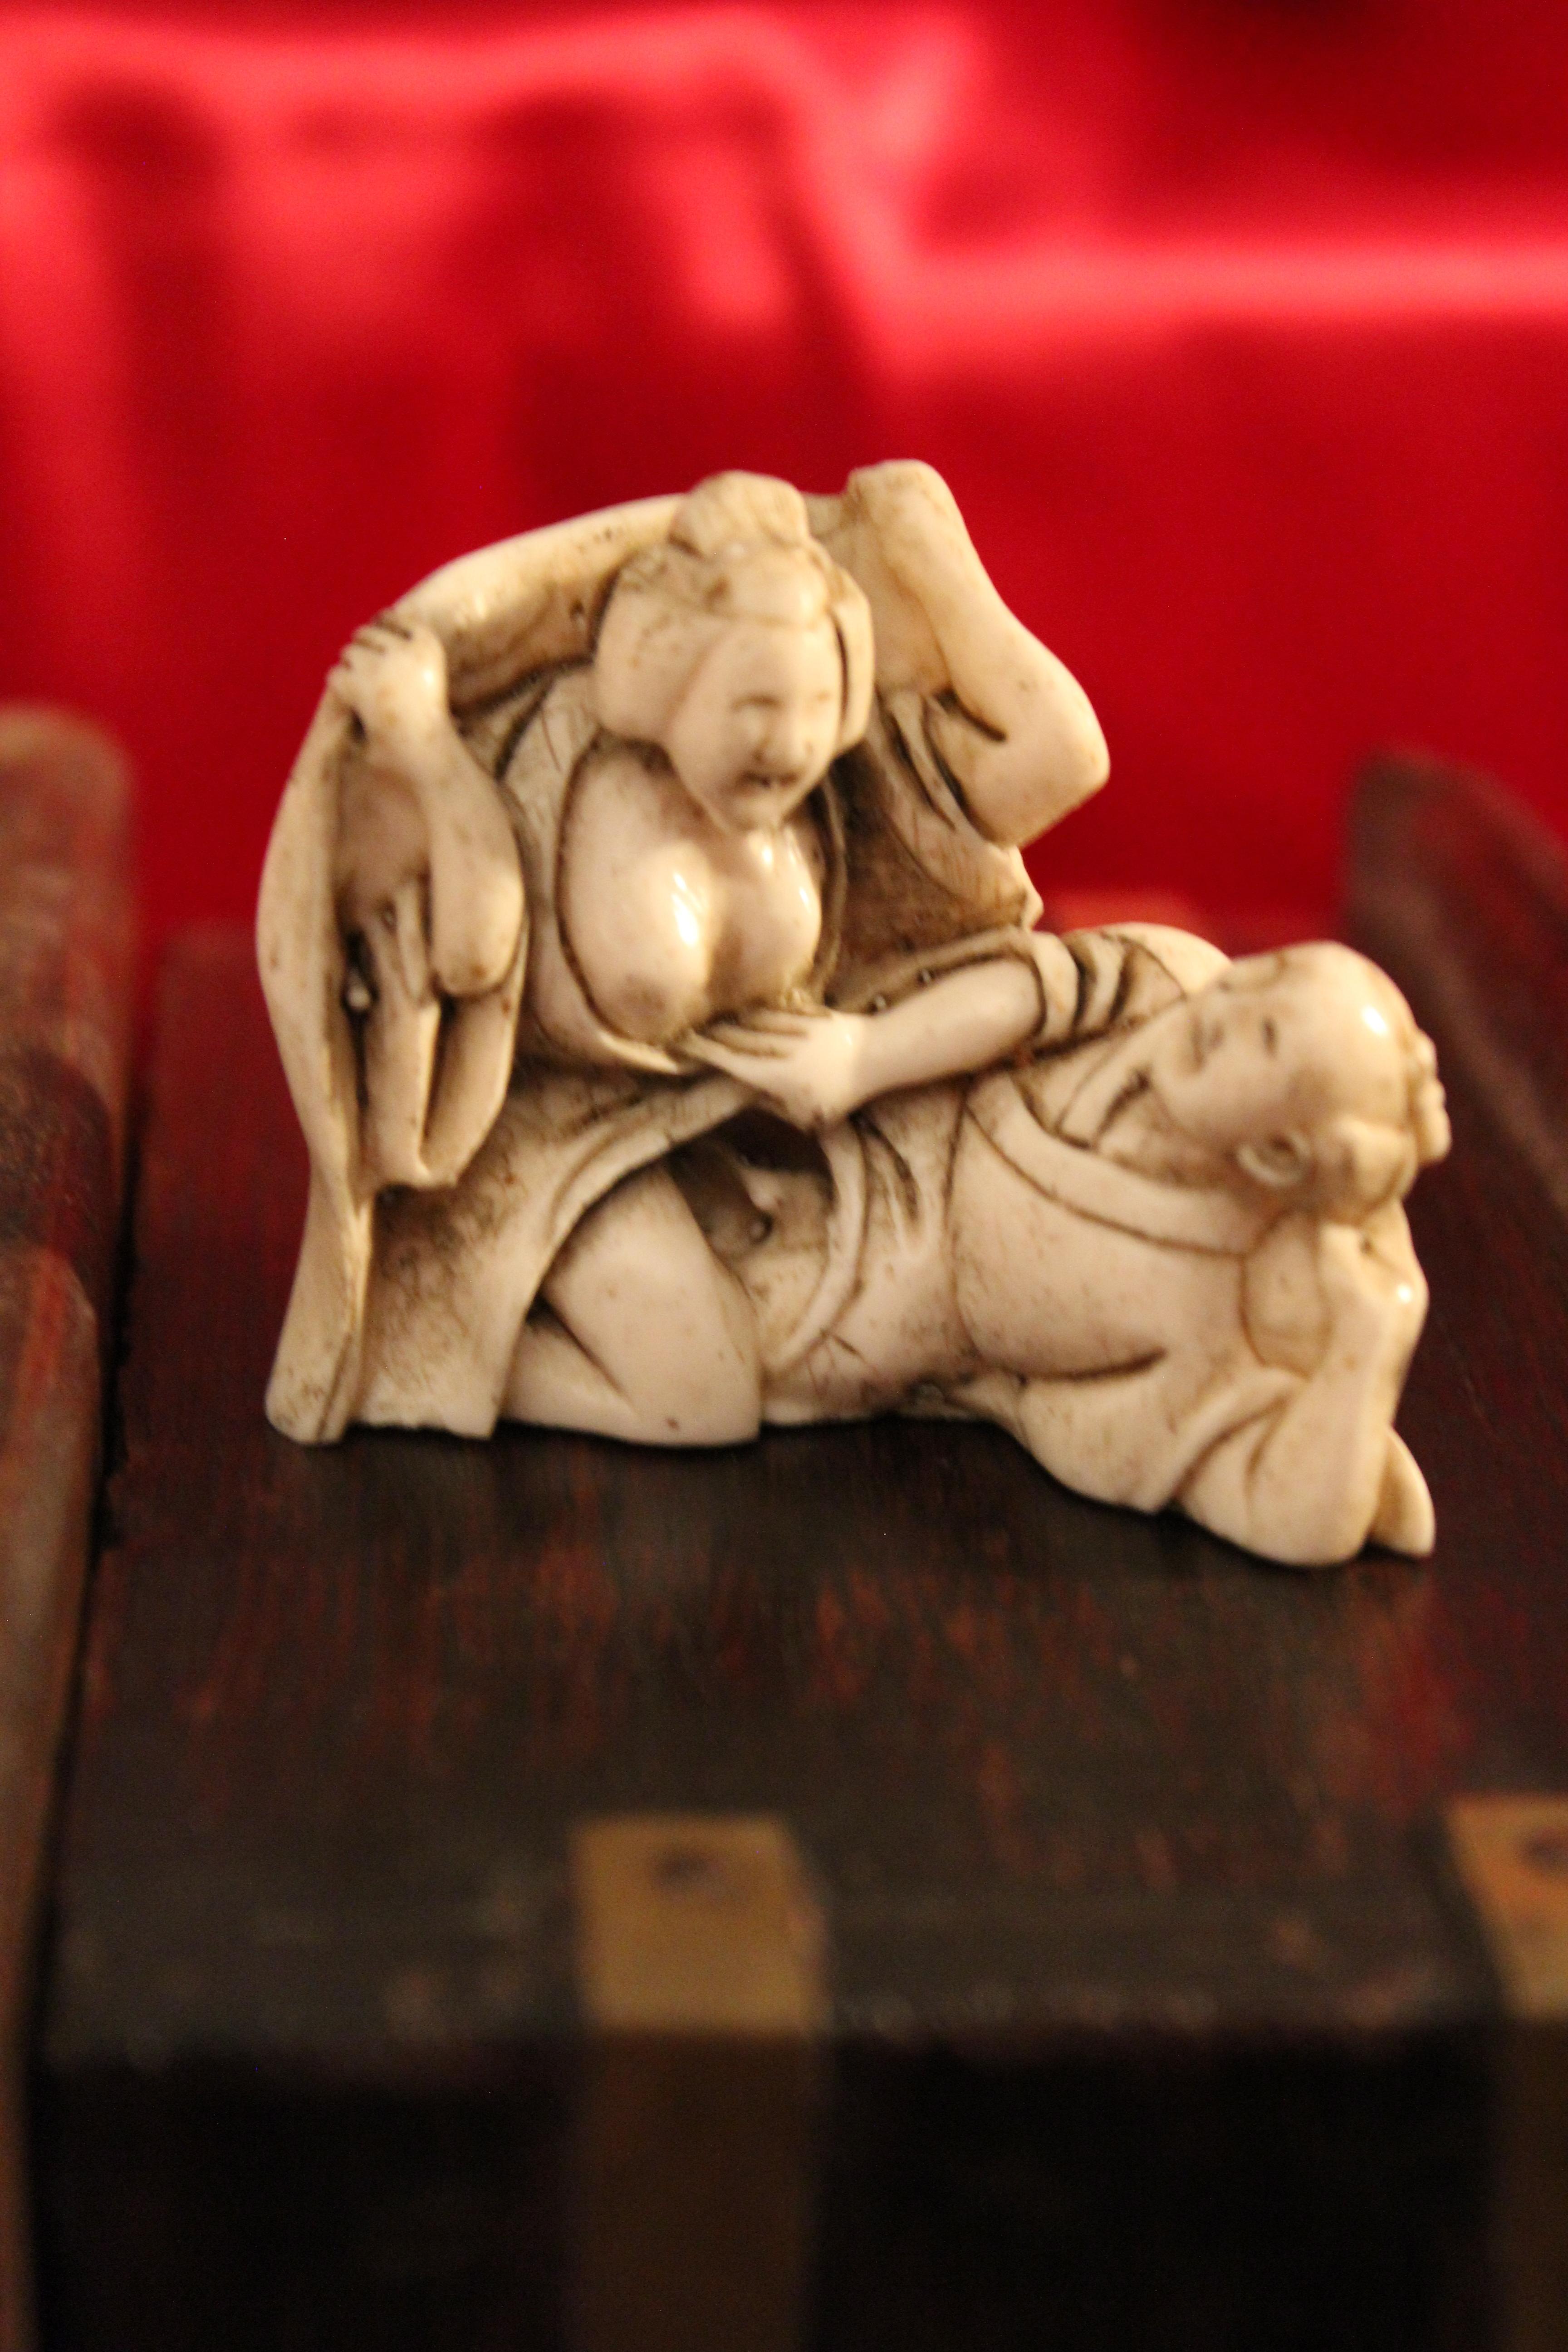 CURIOSA ANCIEN EROTIQUE STATUETTE SCENE COUPLE LIBERTIN KAMASUTRA superbe patine - IMG_1439